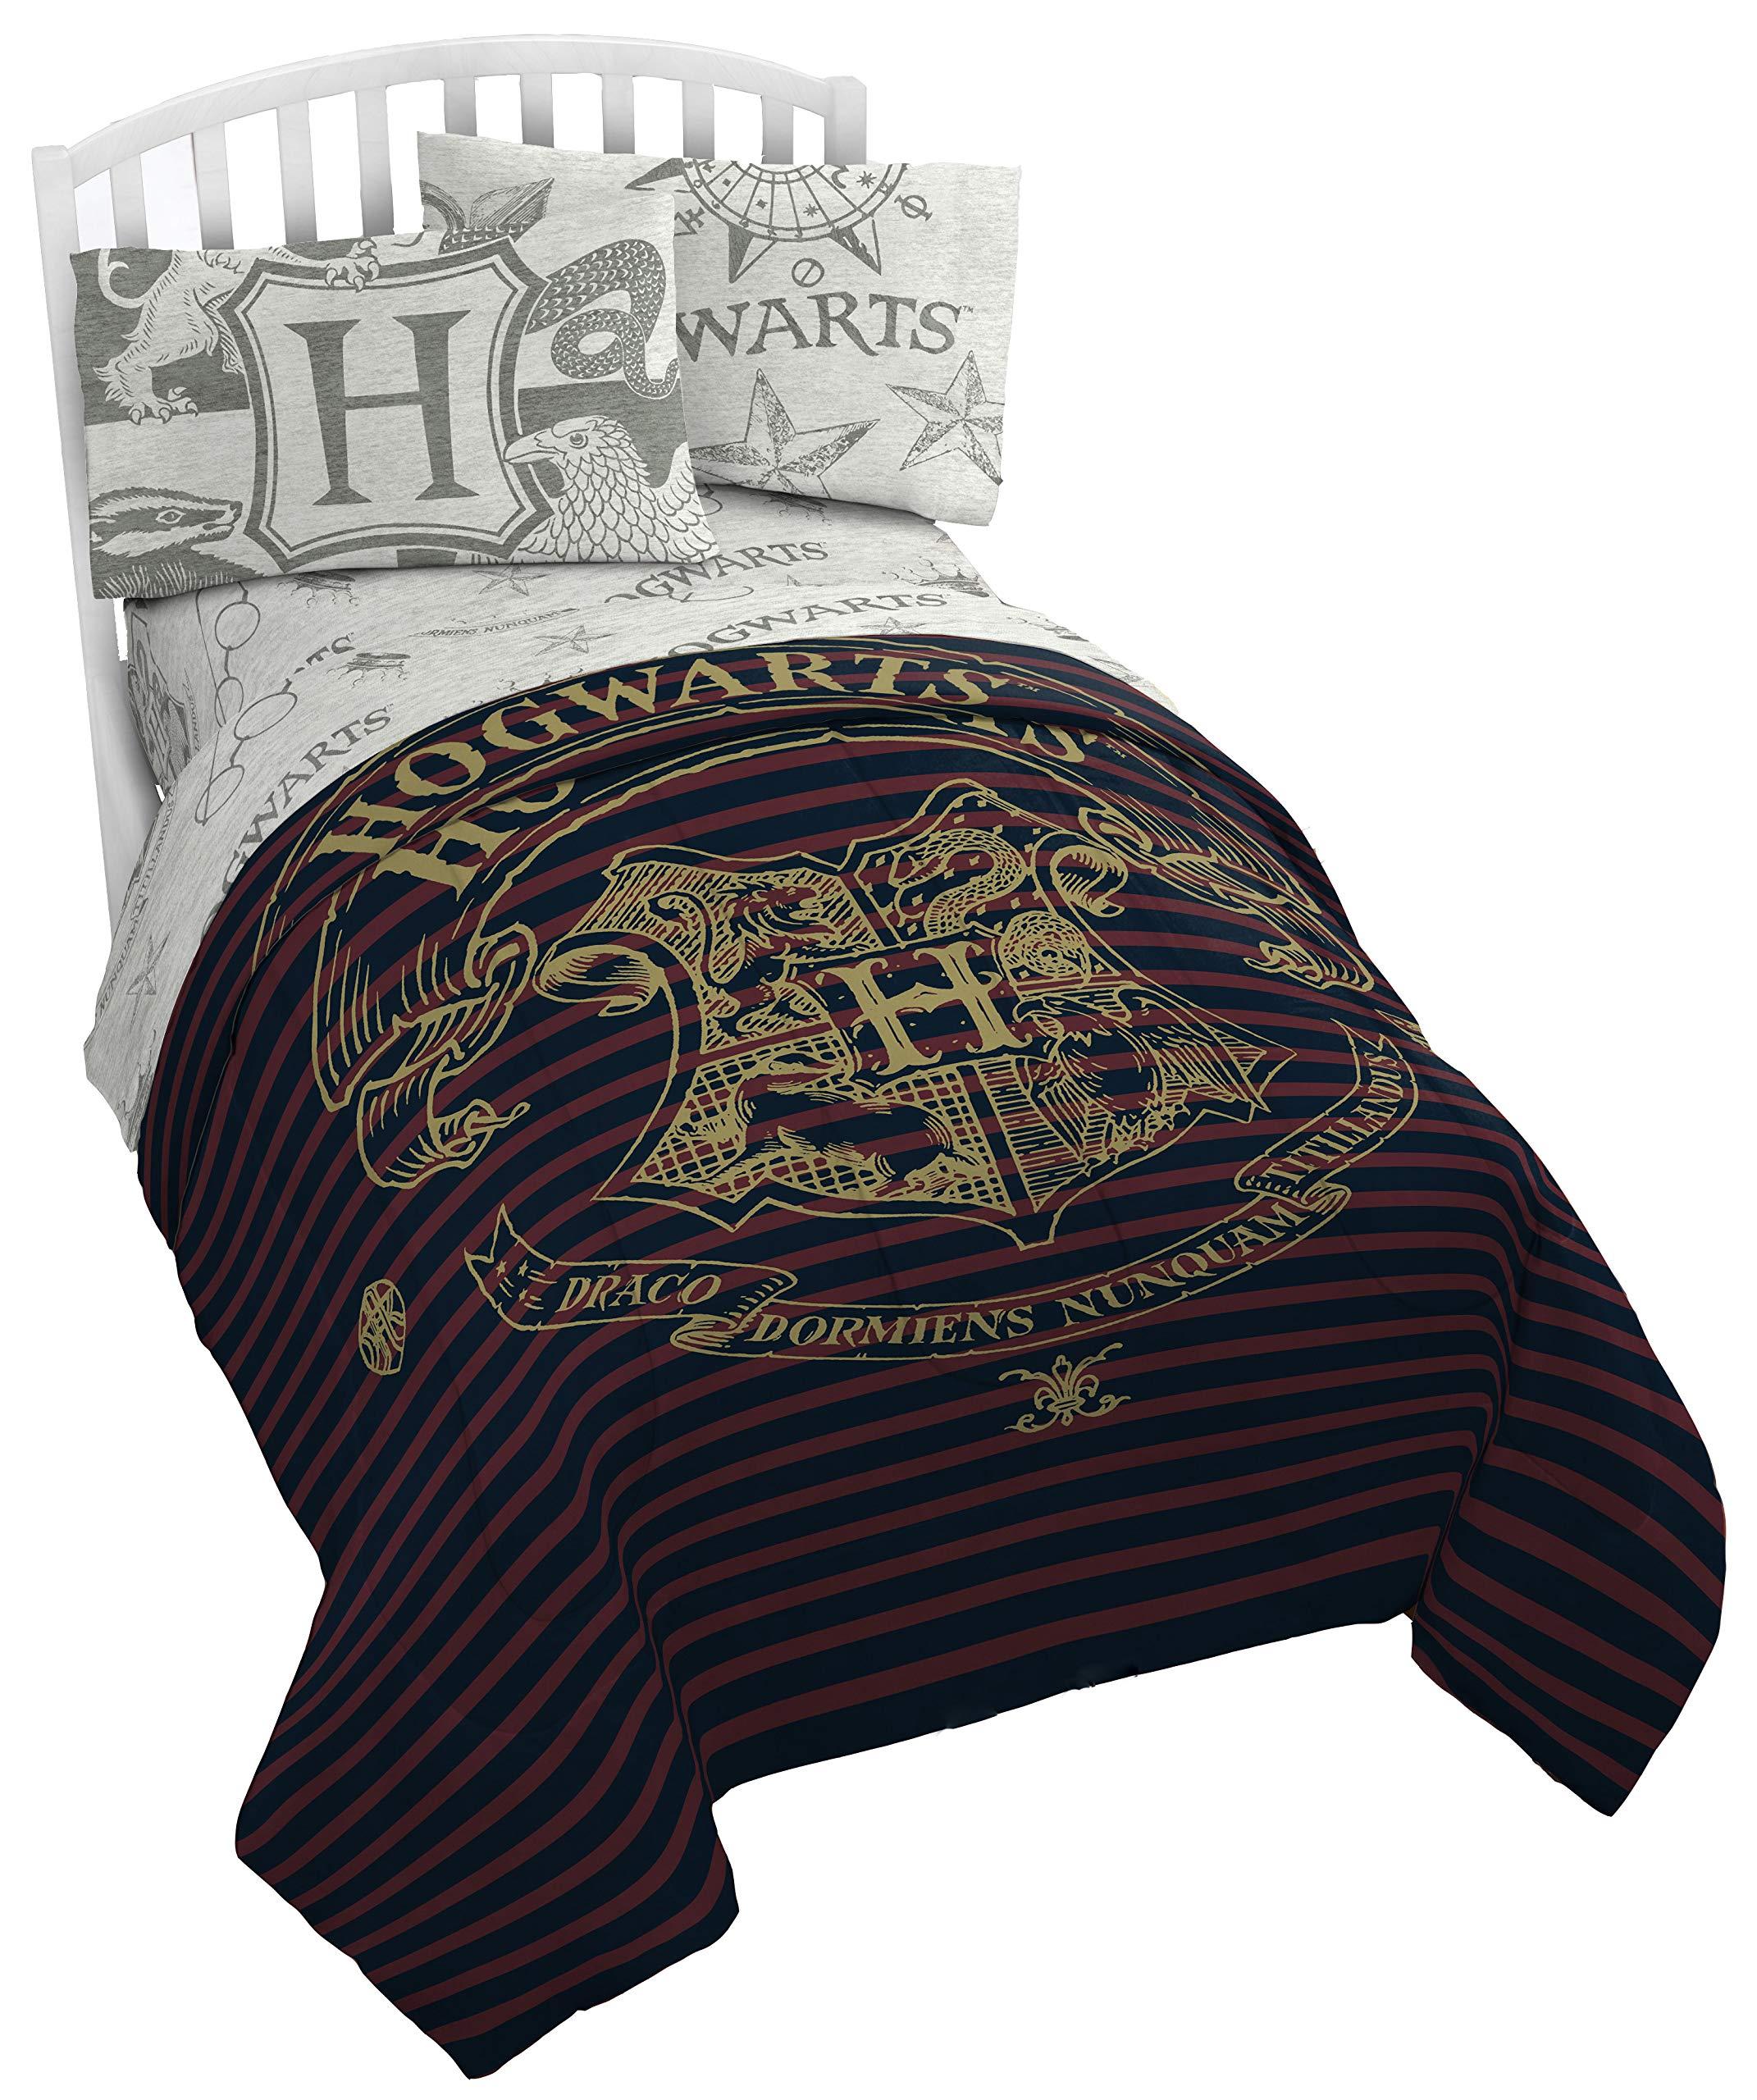 Jay Franco Harry Potter Spellbound 5 Piece Full Bed Set - Includes Reversible Comforter & Sheet Set - Bedding Features Hogwarts Logo - Super Soft Polyester (Official Harry Potter Product)